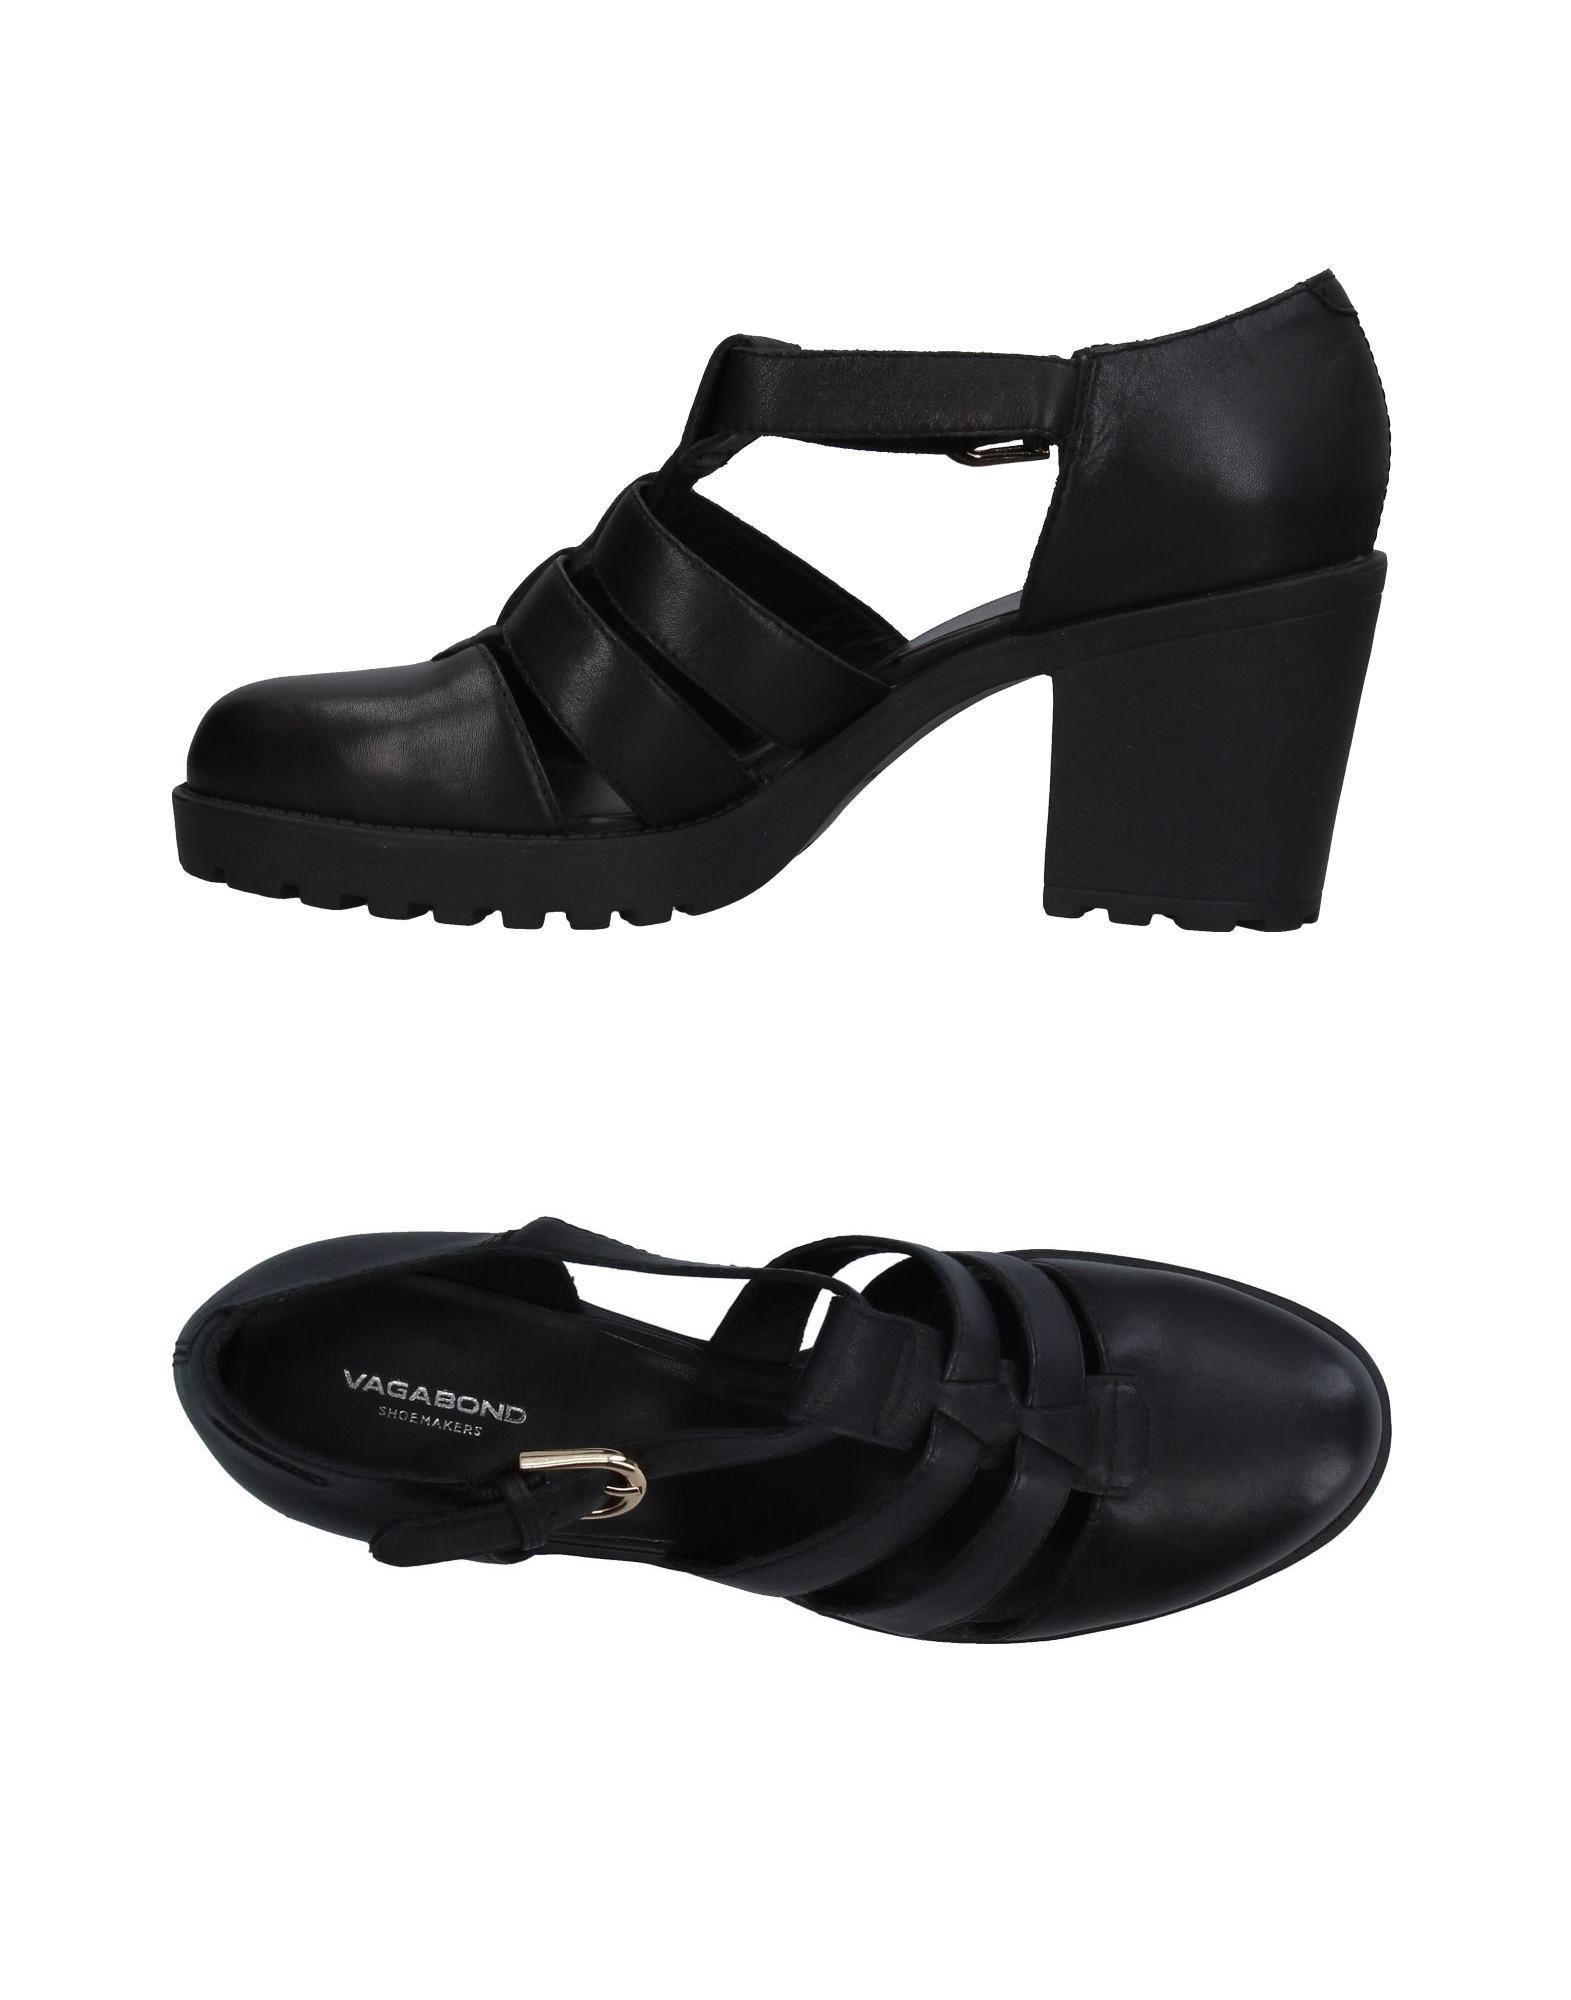 VAGABOND SHOEMAKERS Туфли vagabond shoemakers полусапоги и высокие ботинки